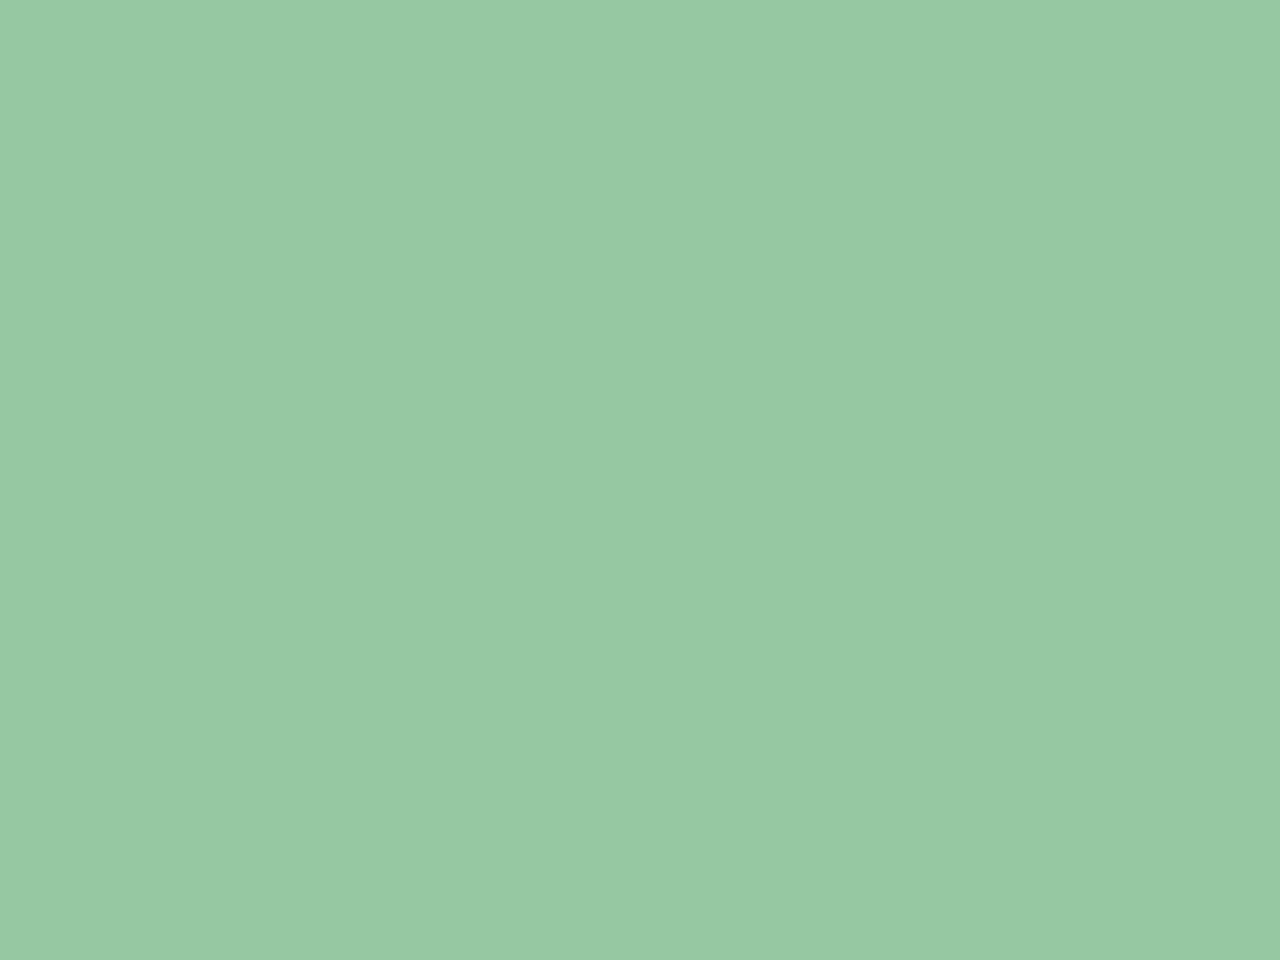 1280x960 Eton Blue Solid Color Background